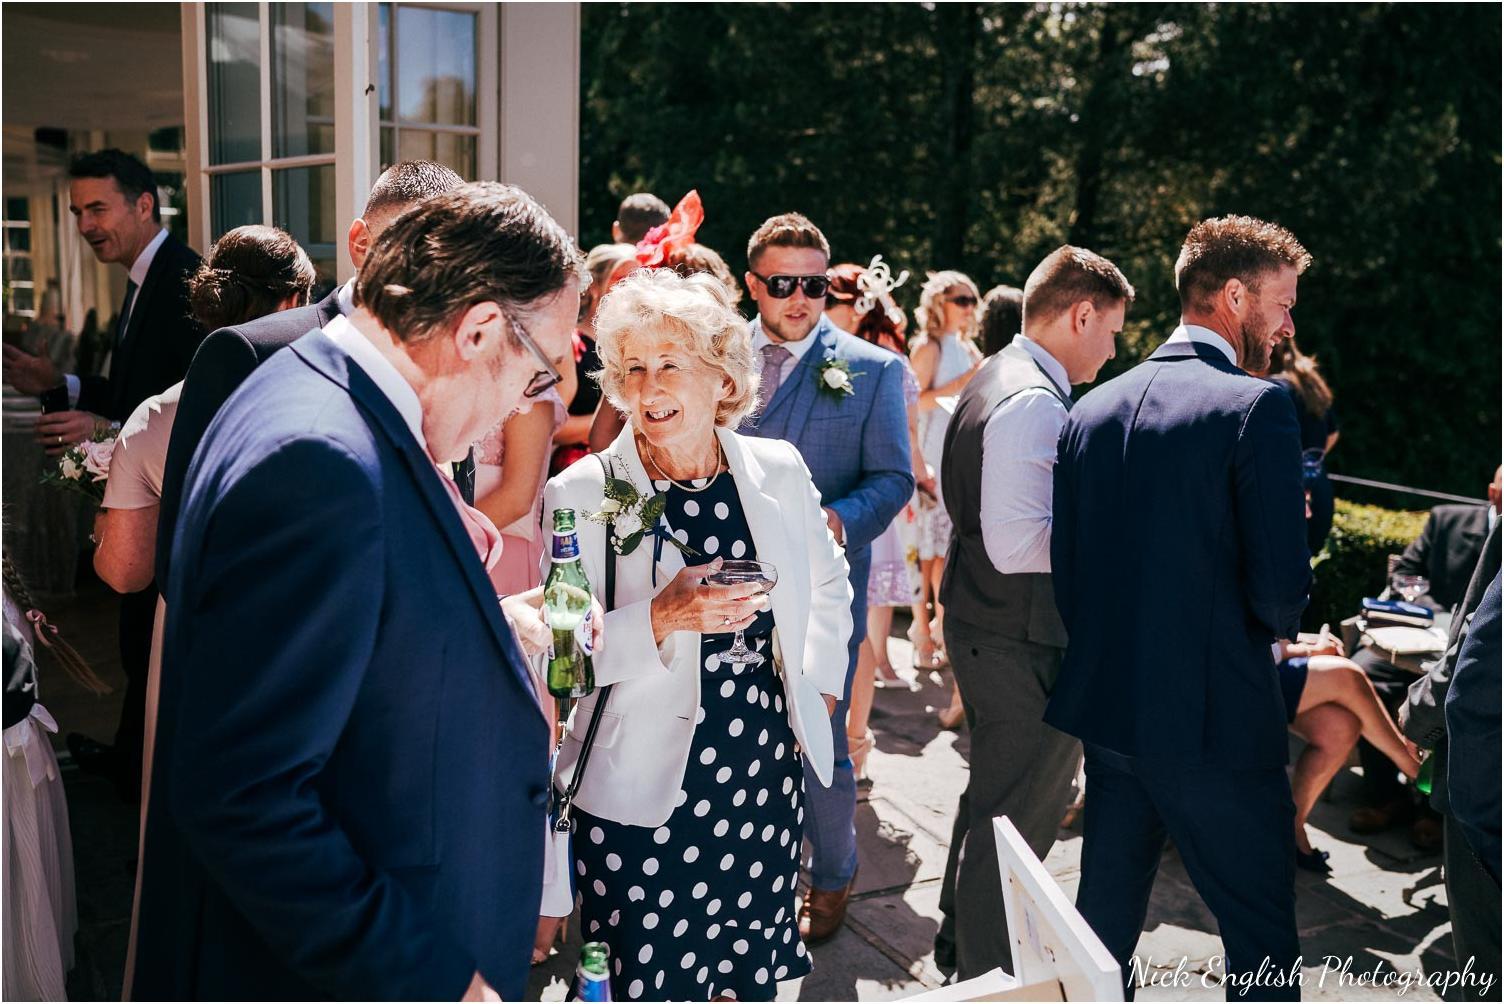 Mitton_Hall_Wedding_Photograph-91.jpg